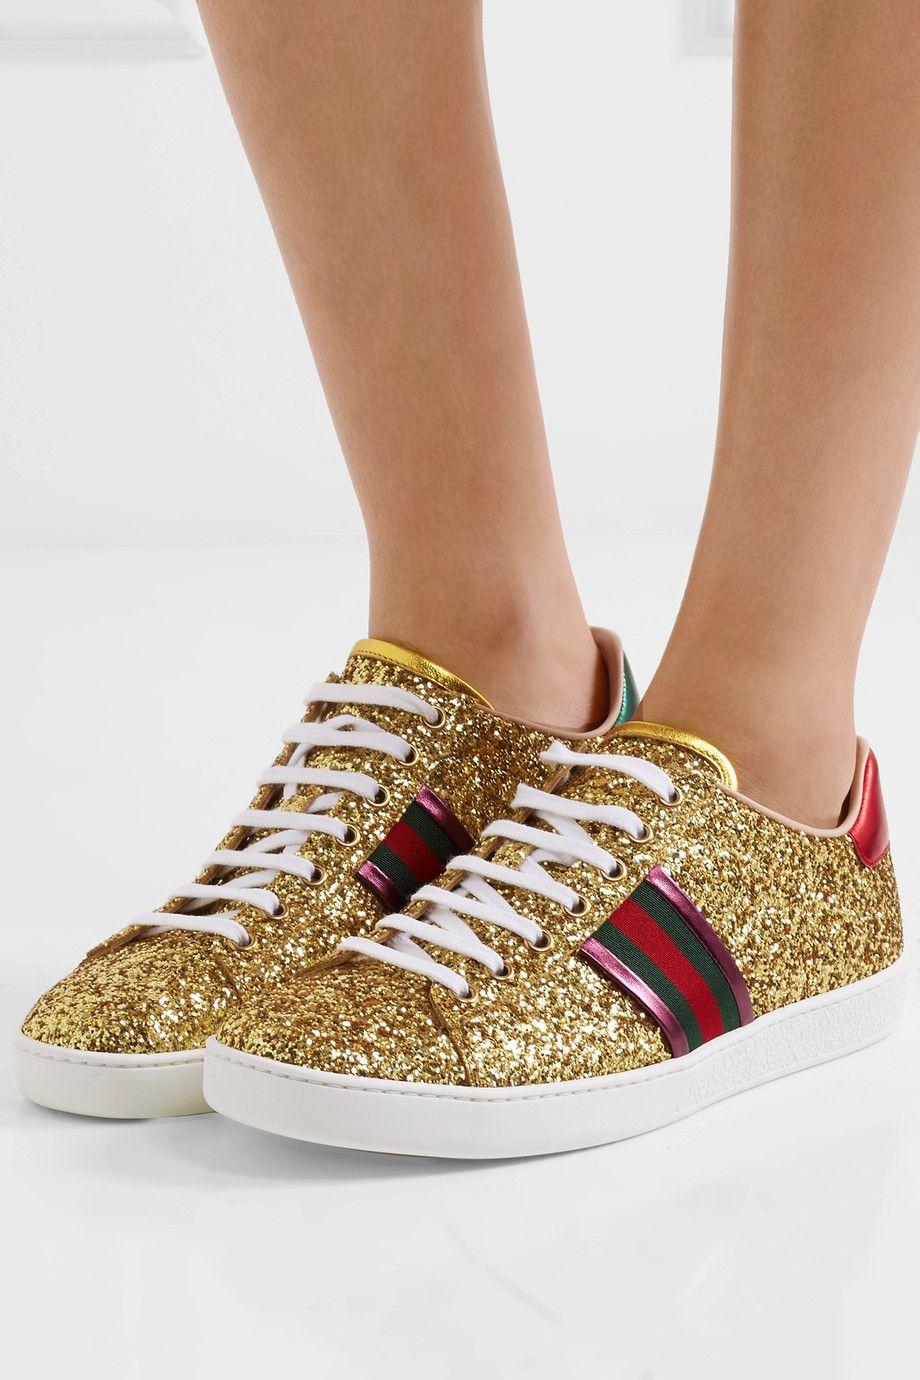 As Chaussures De Sport En Cuir Pailletés Garni Métallique - Or Gucci gvSG8Z0IR